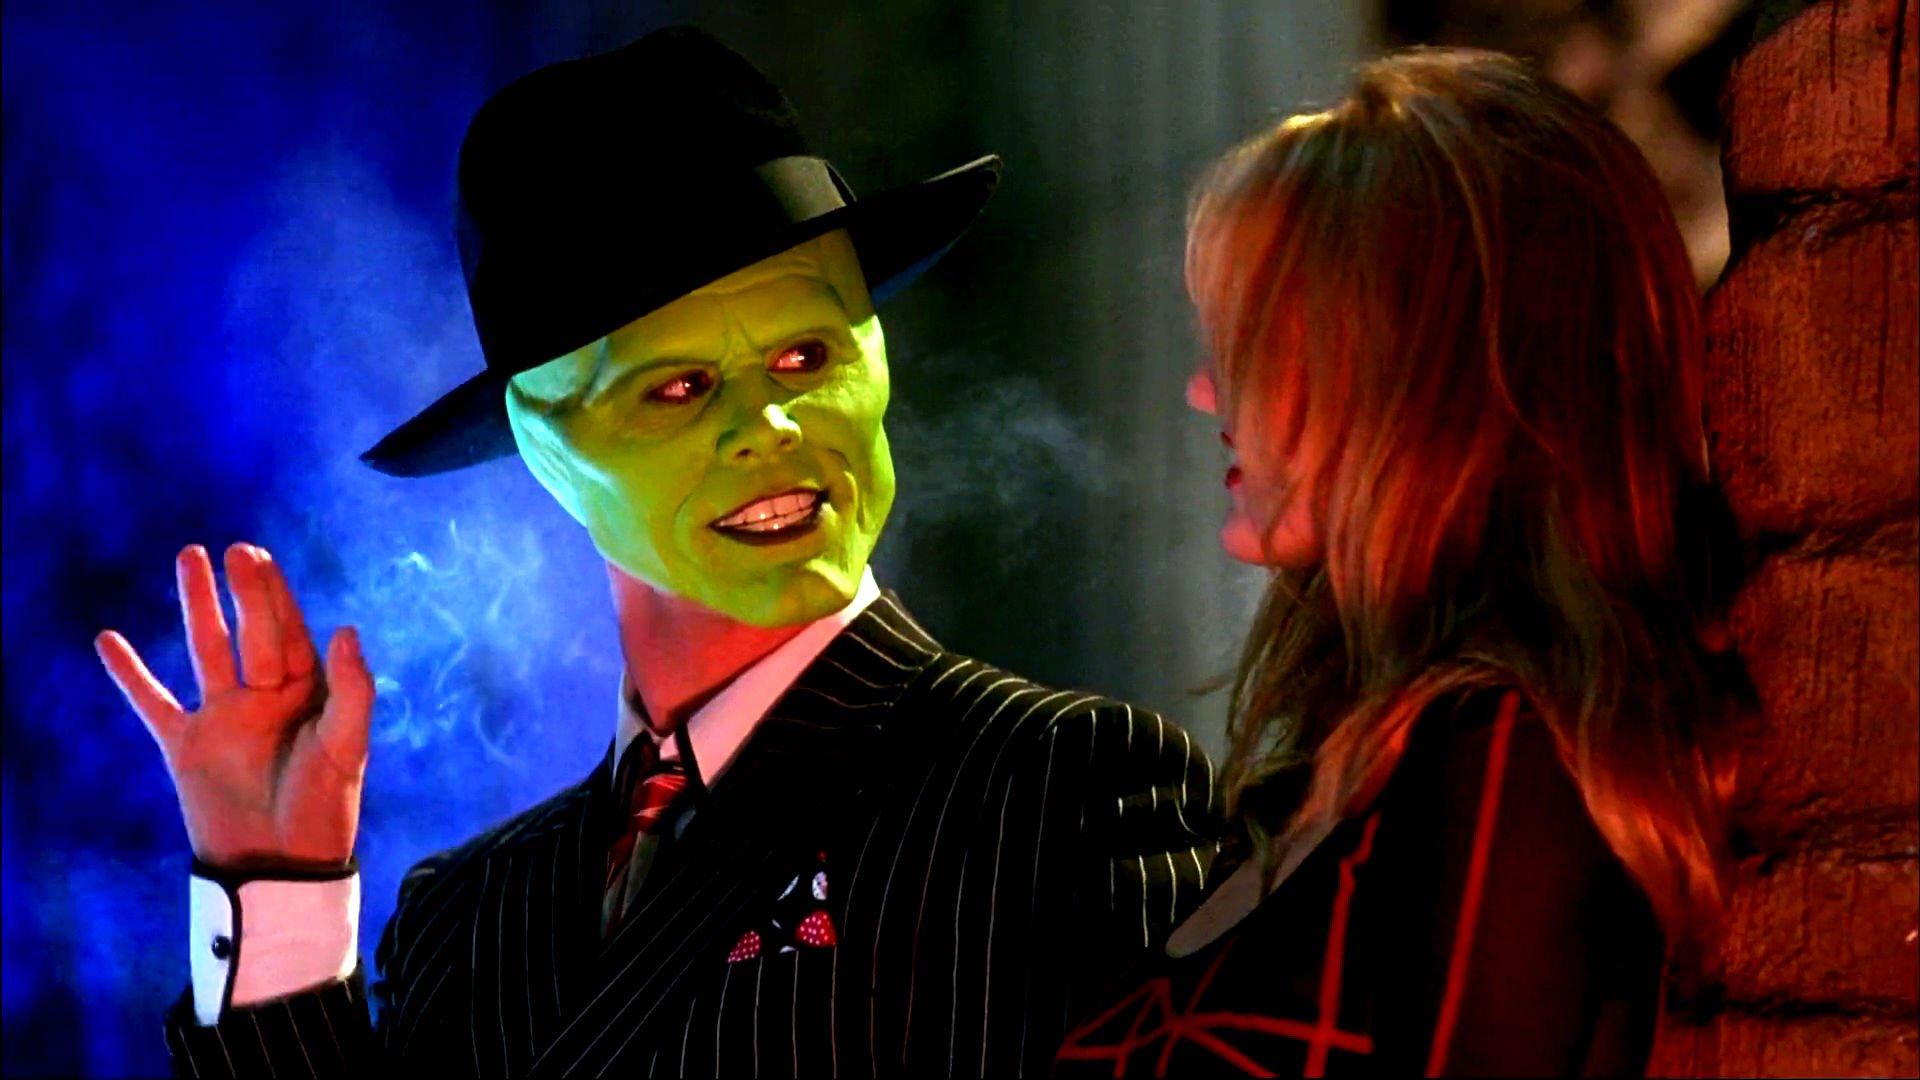 THE-MASK comedy crime fantasy family mask (27) wallpaper ...